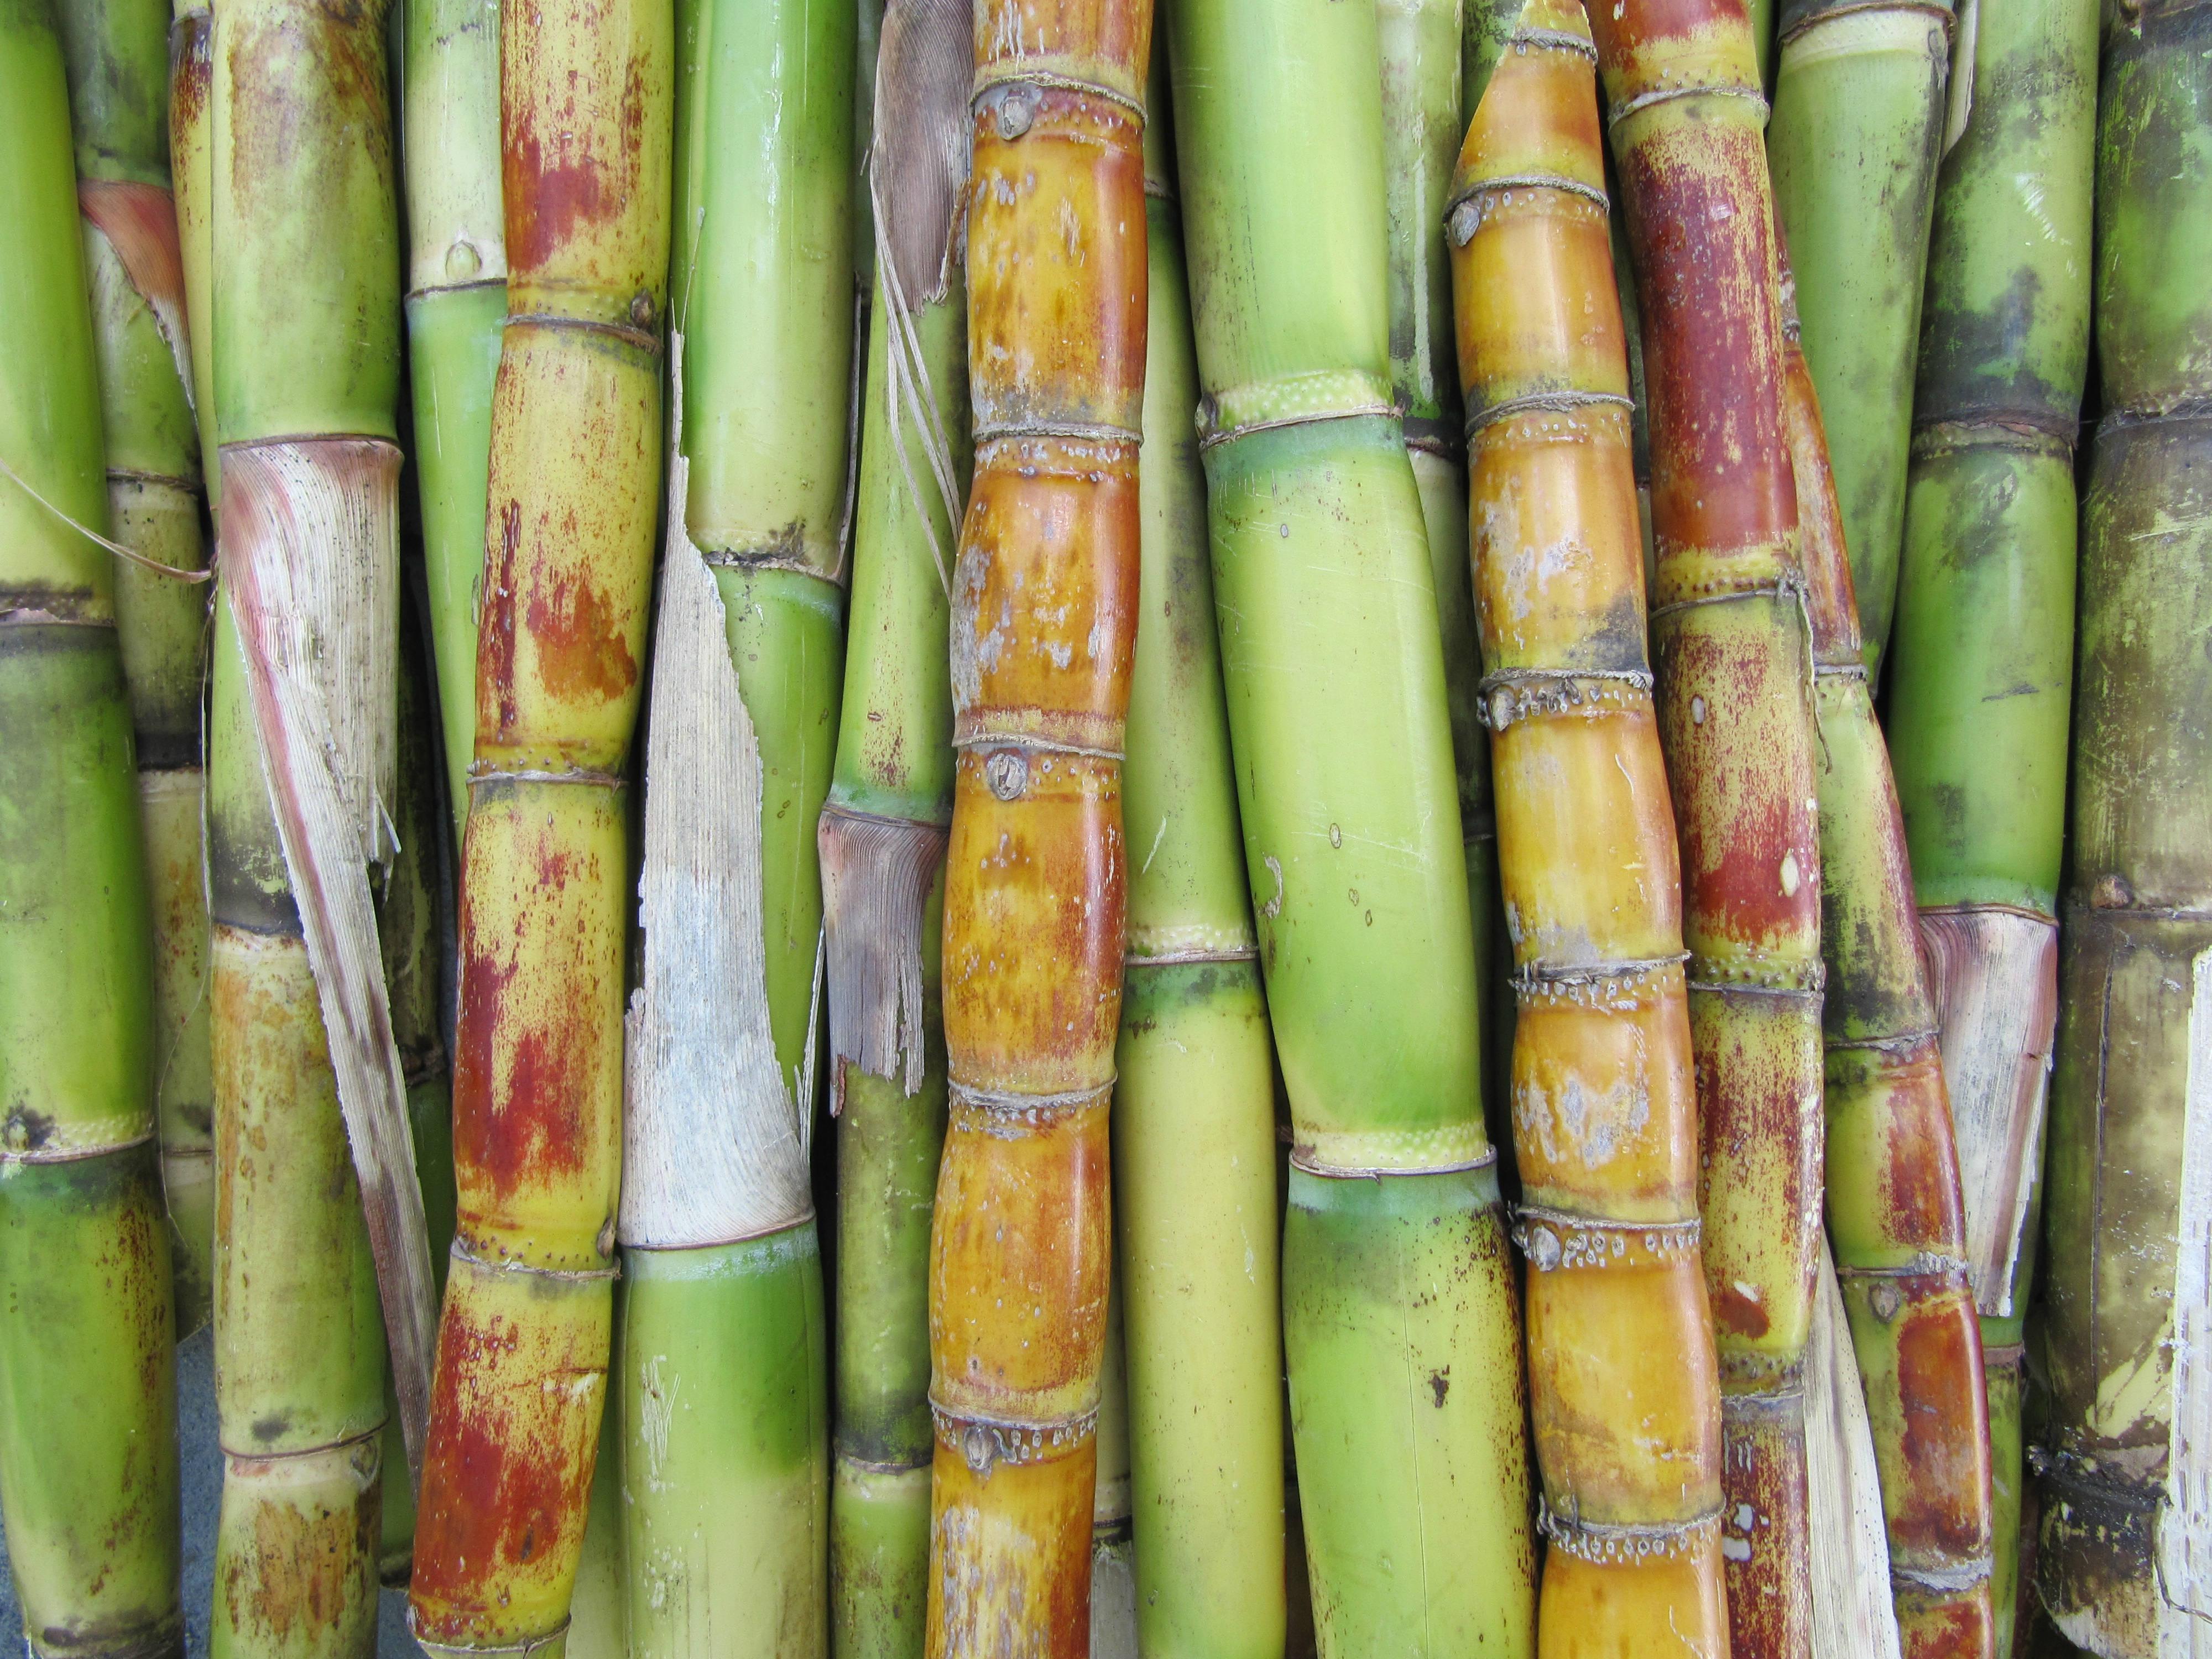 Sugar Cane You Can Eat Raw 4000x3000